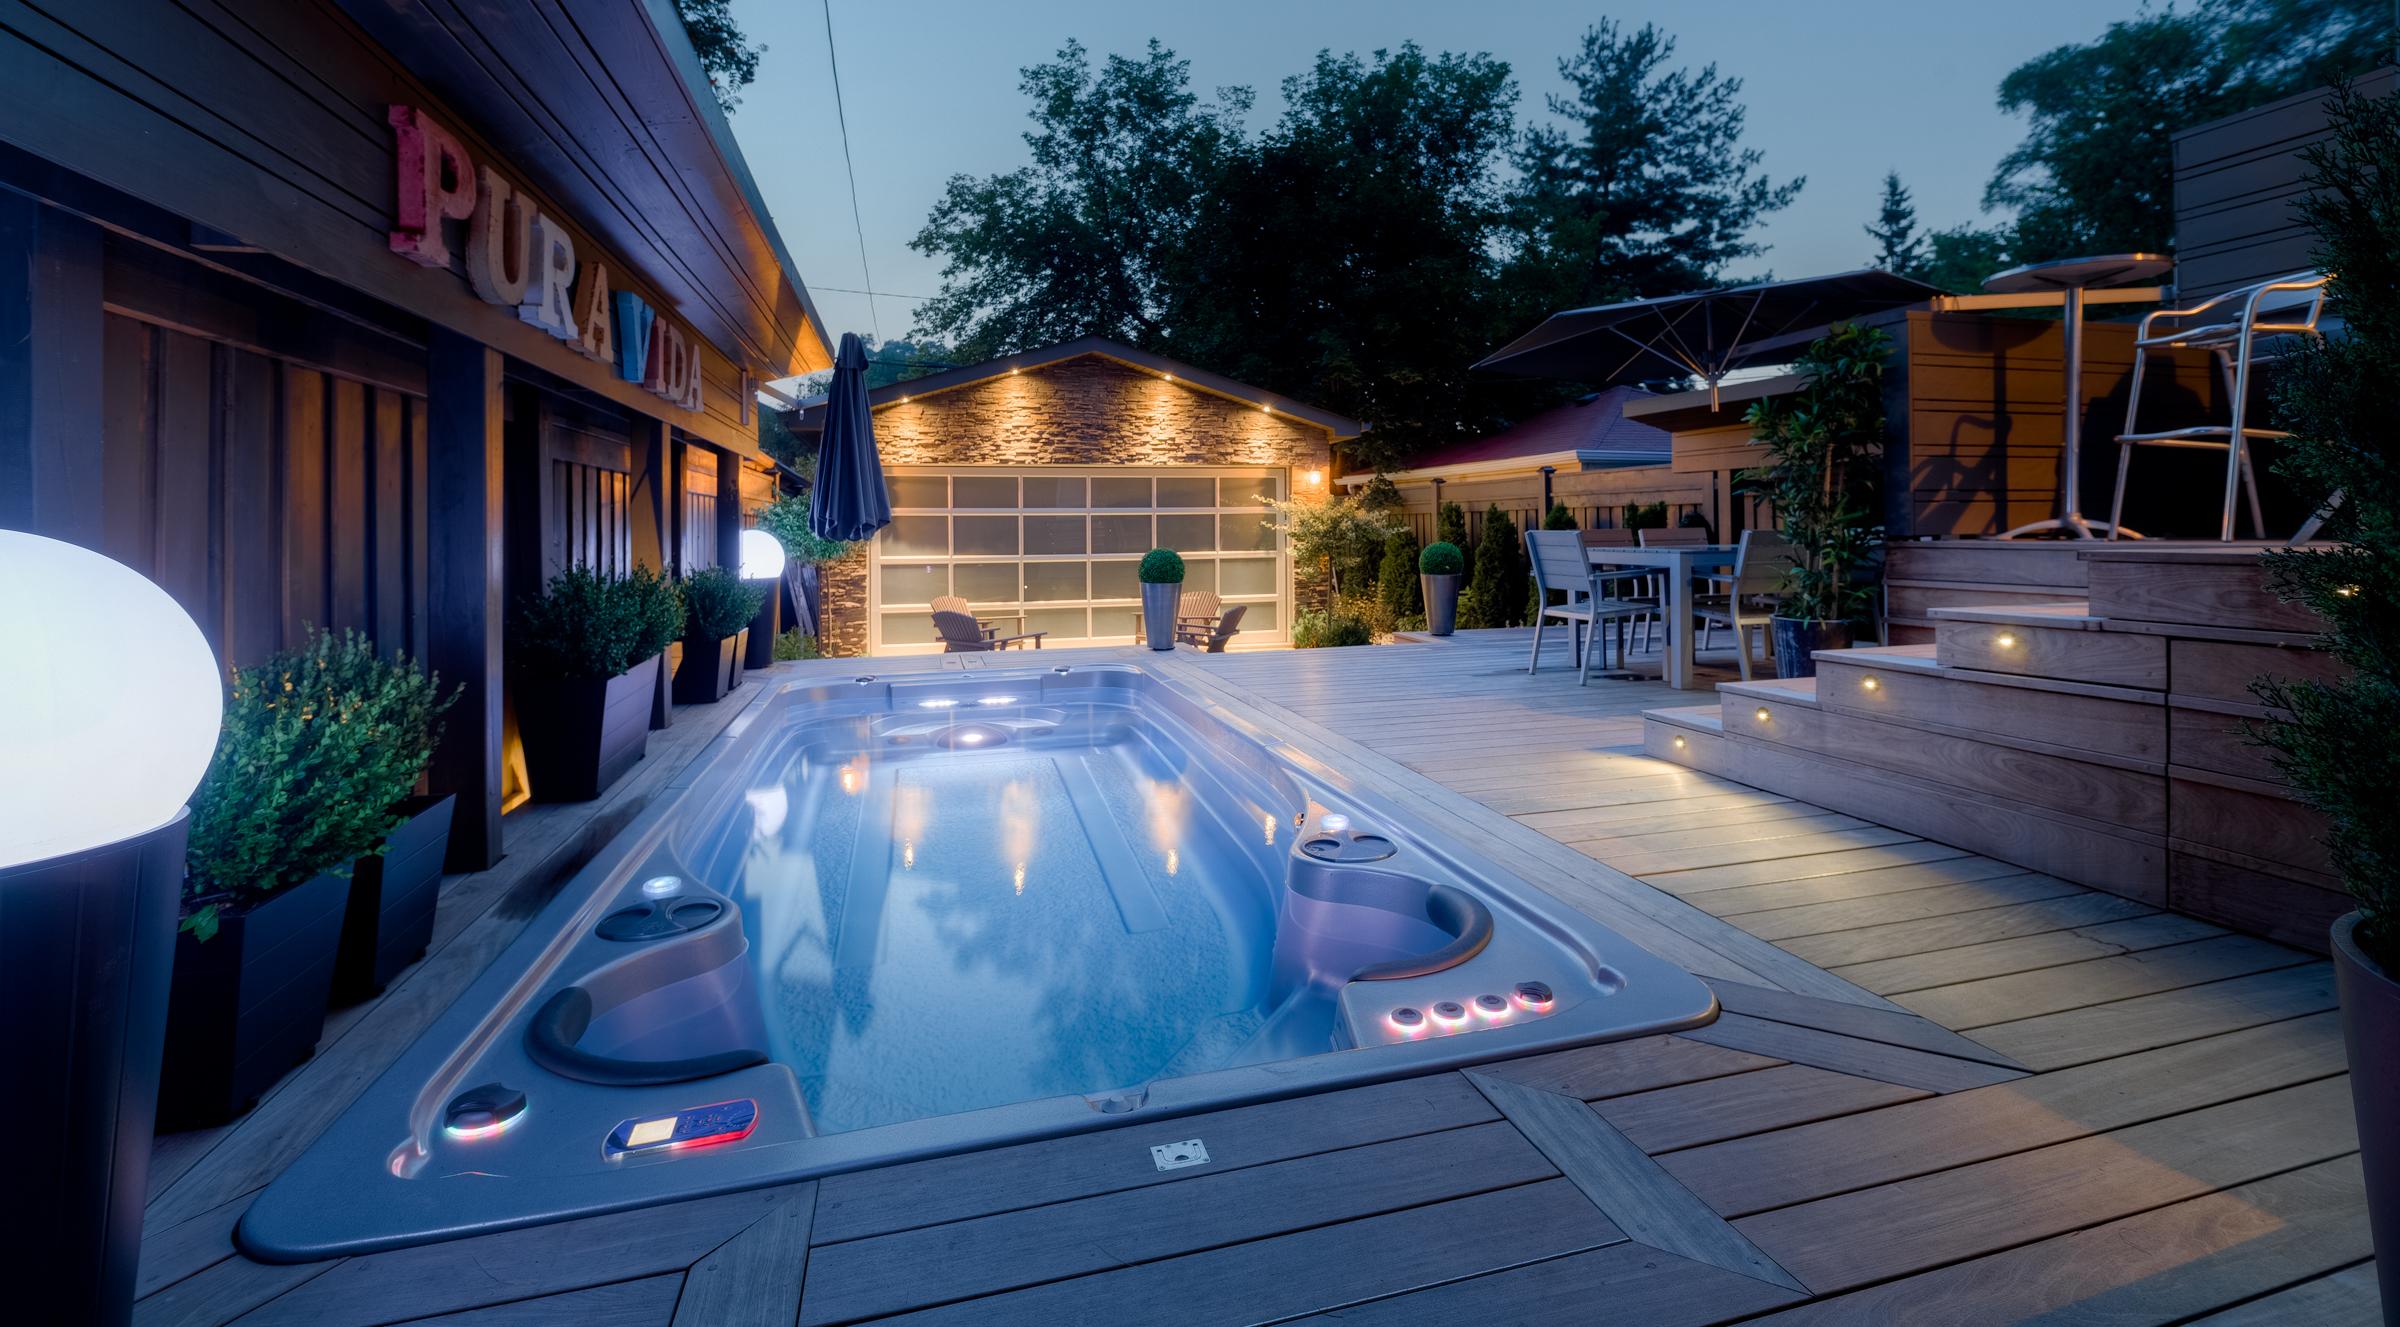 Outdoor swim spa installation at dusk.